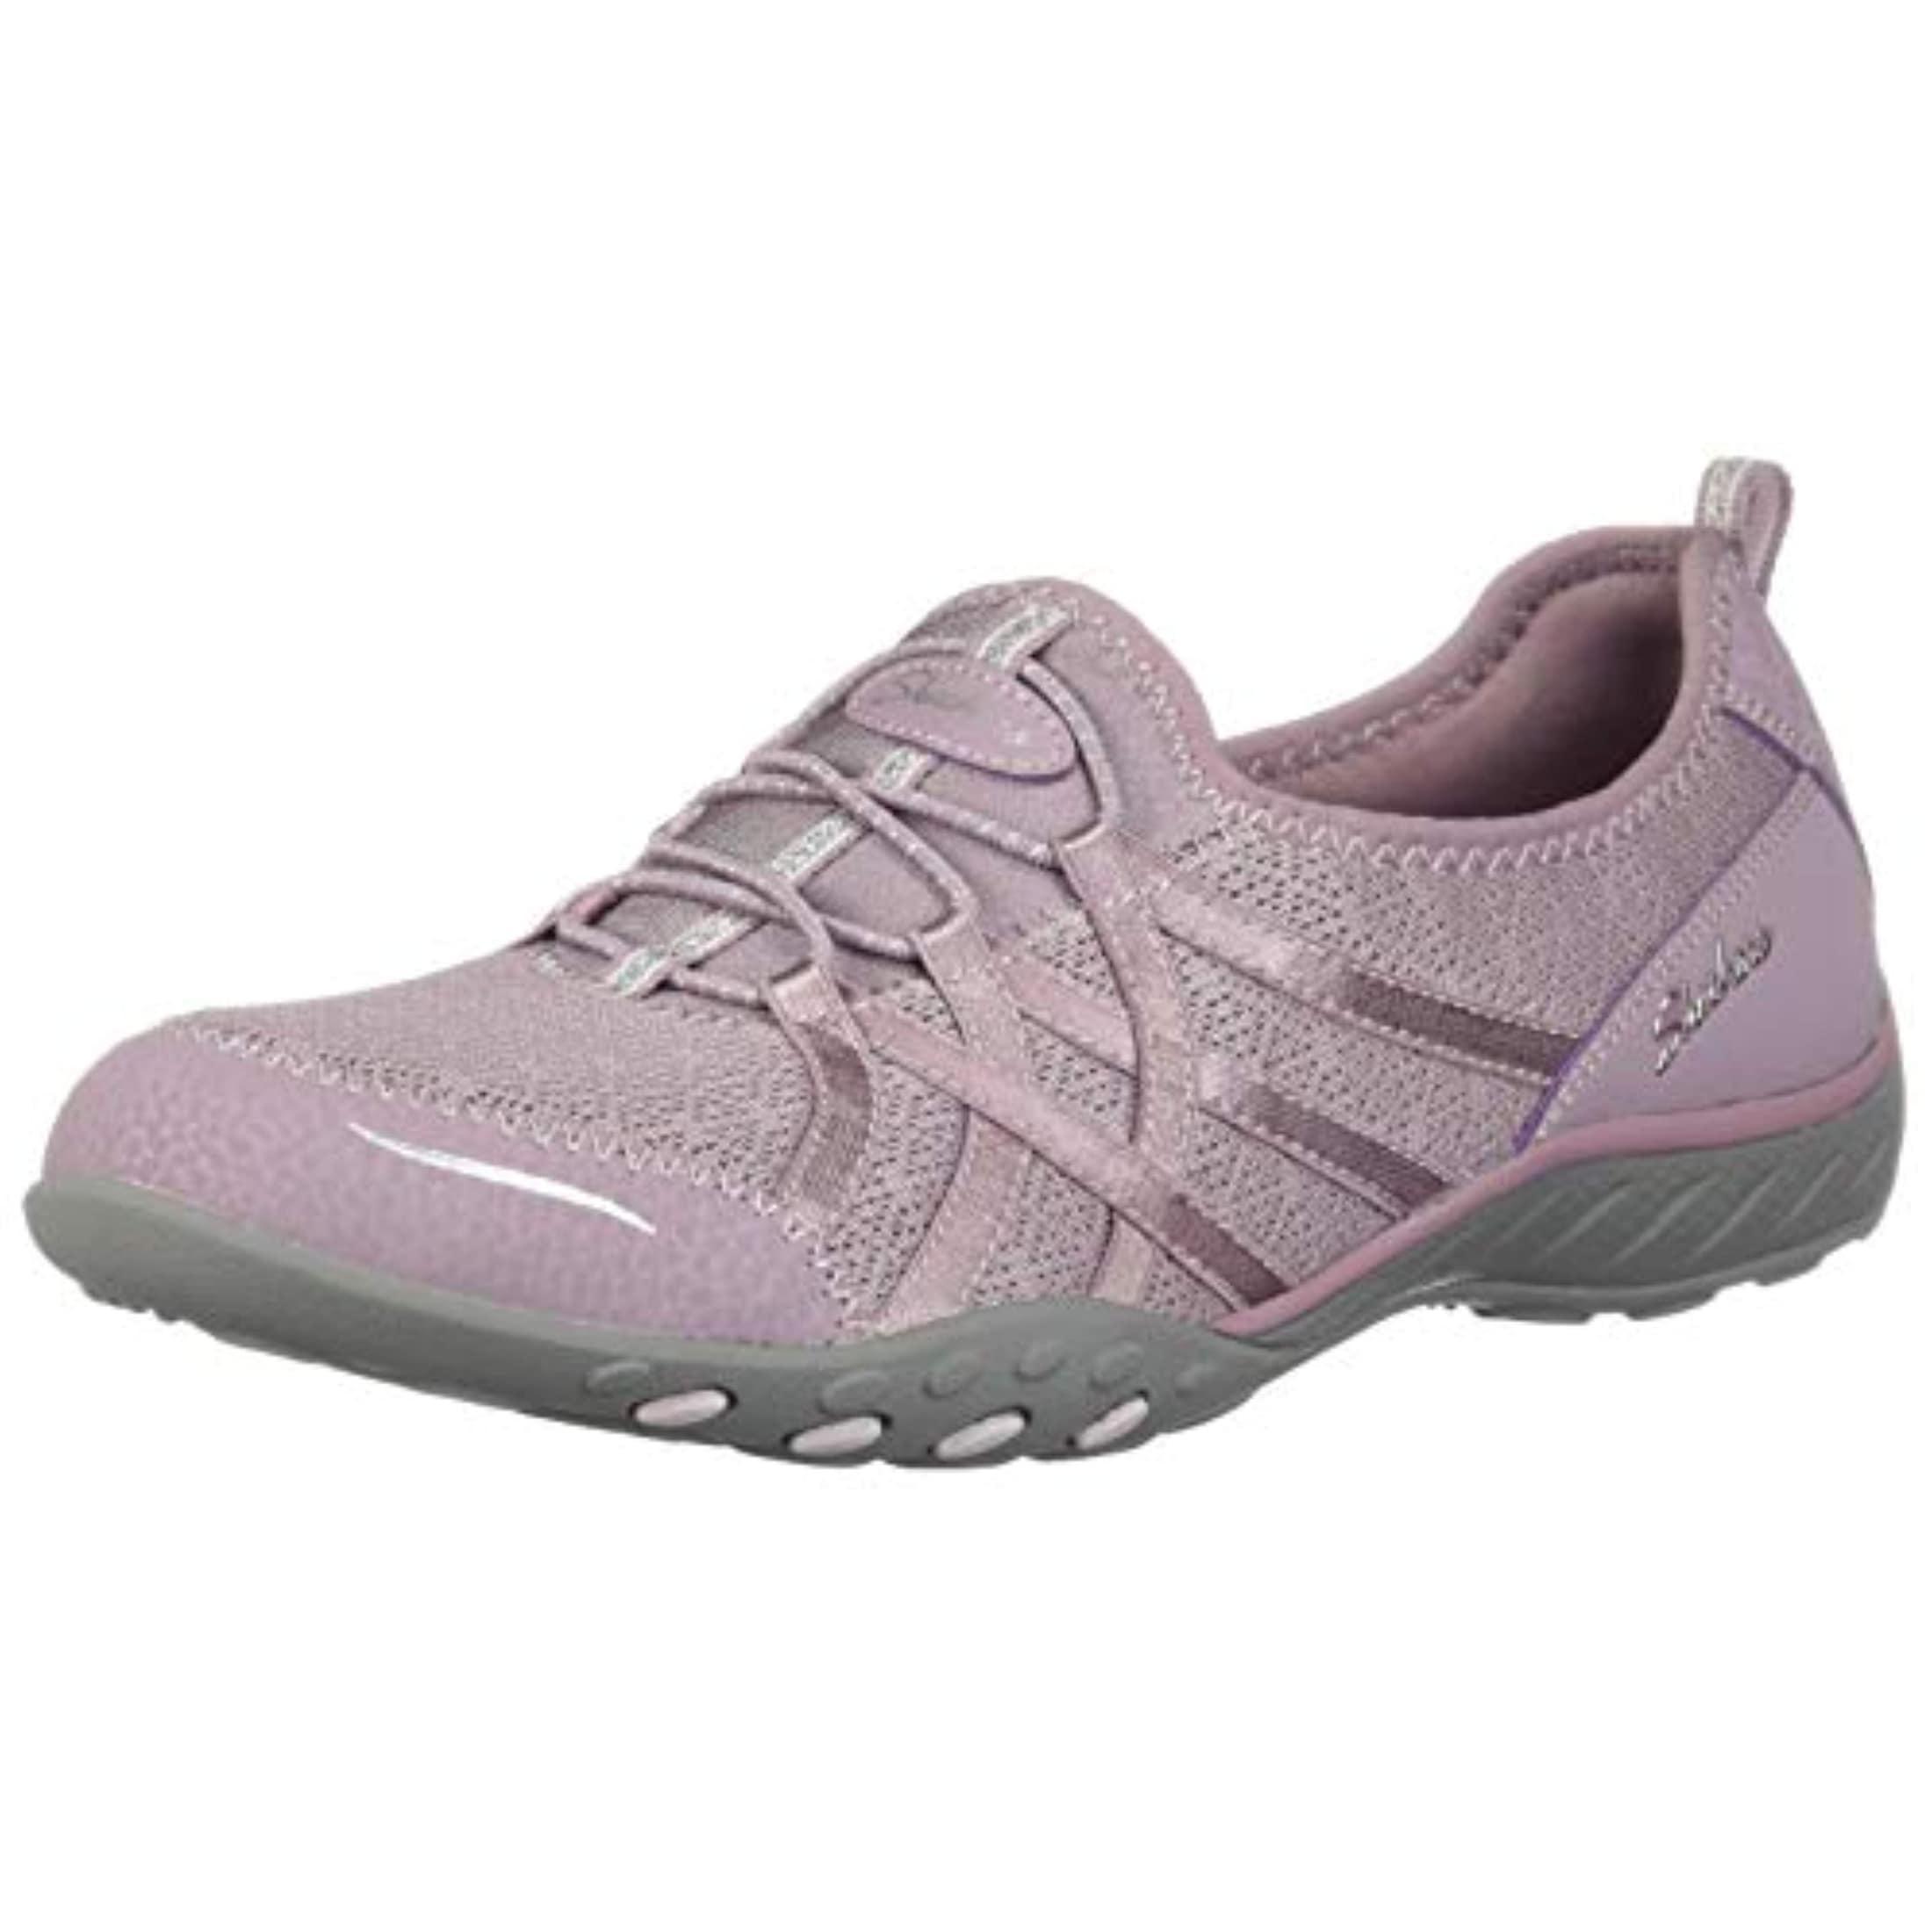 Skechers Relaxed Fit Breathe Easy Envy Me Womens Slip On Sneakers Lavender 8